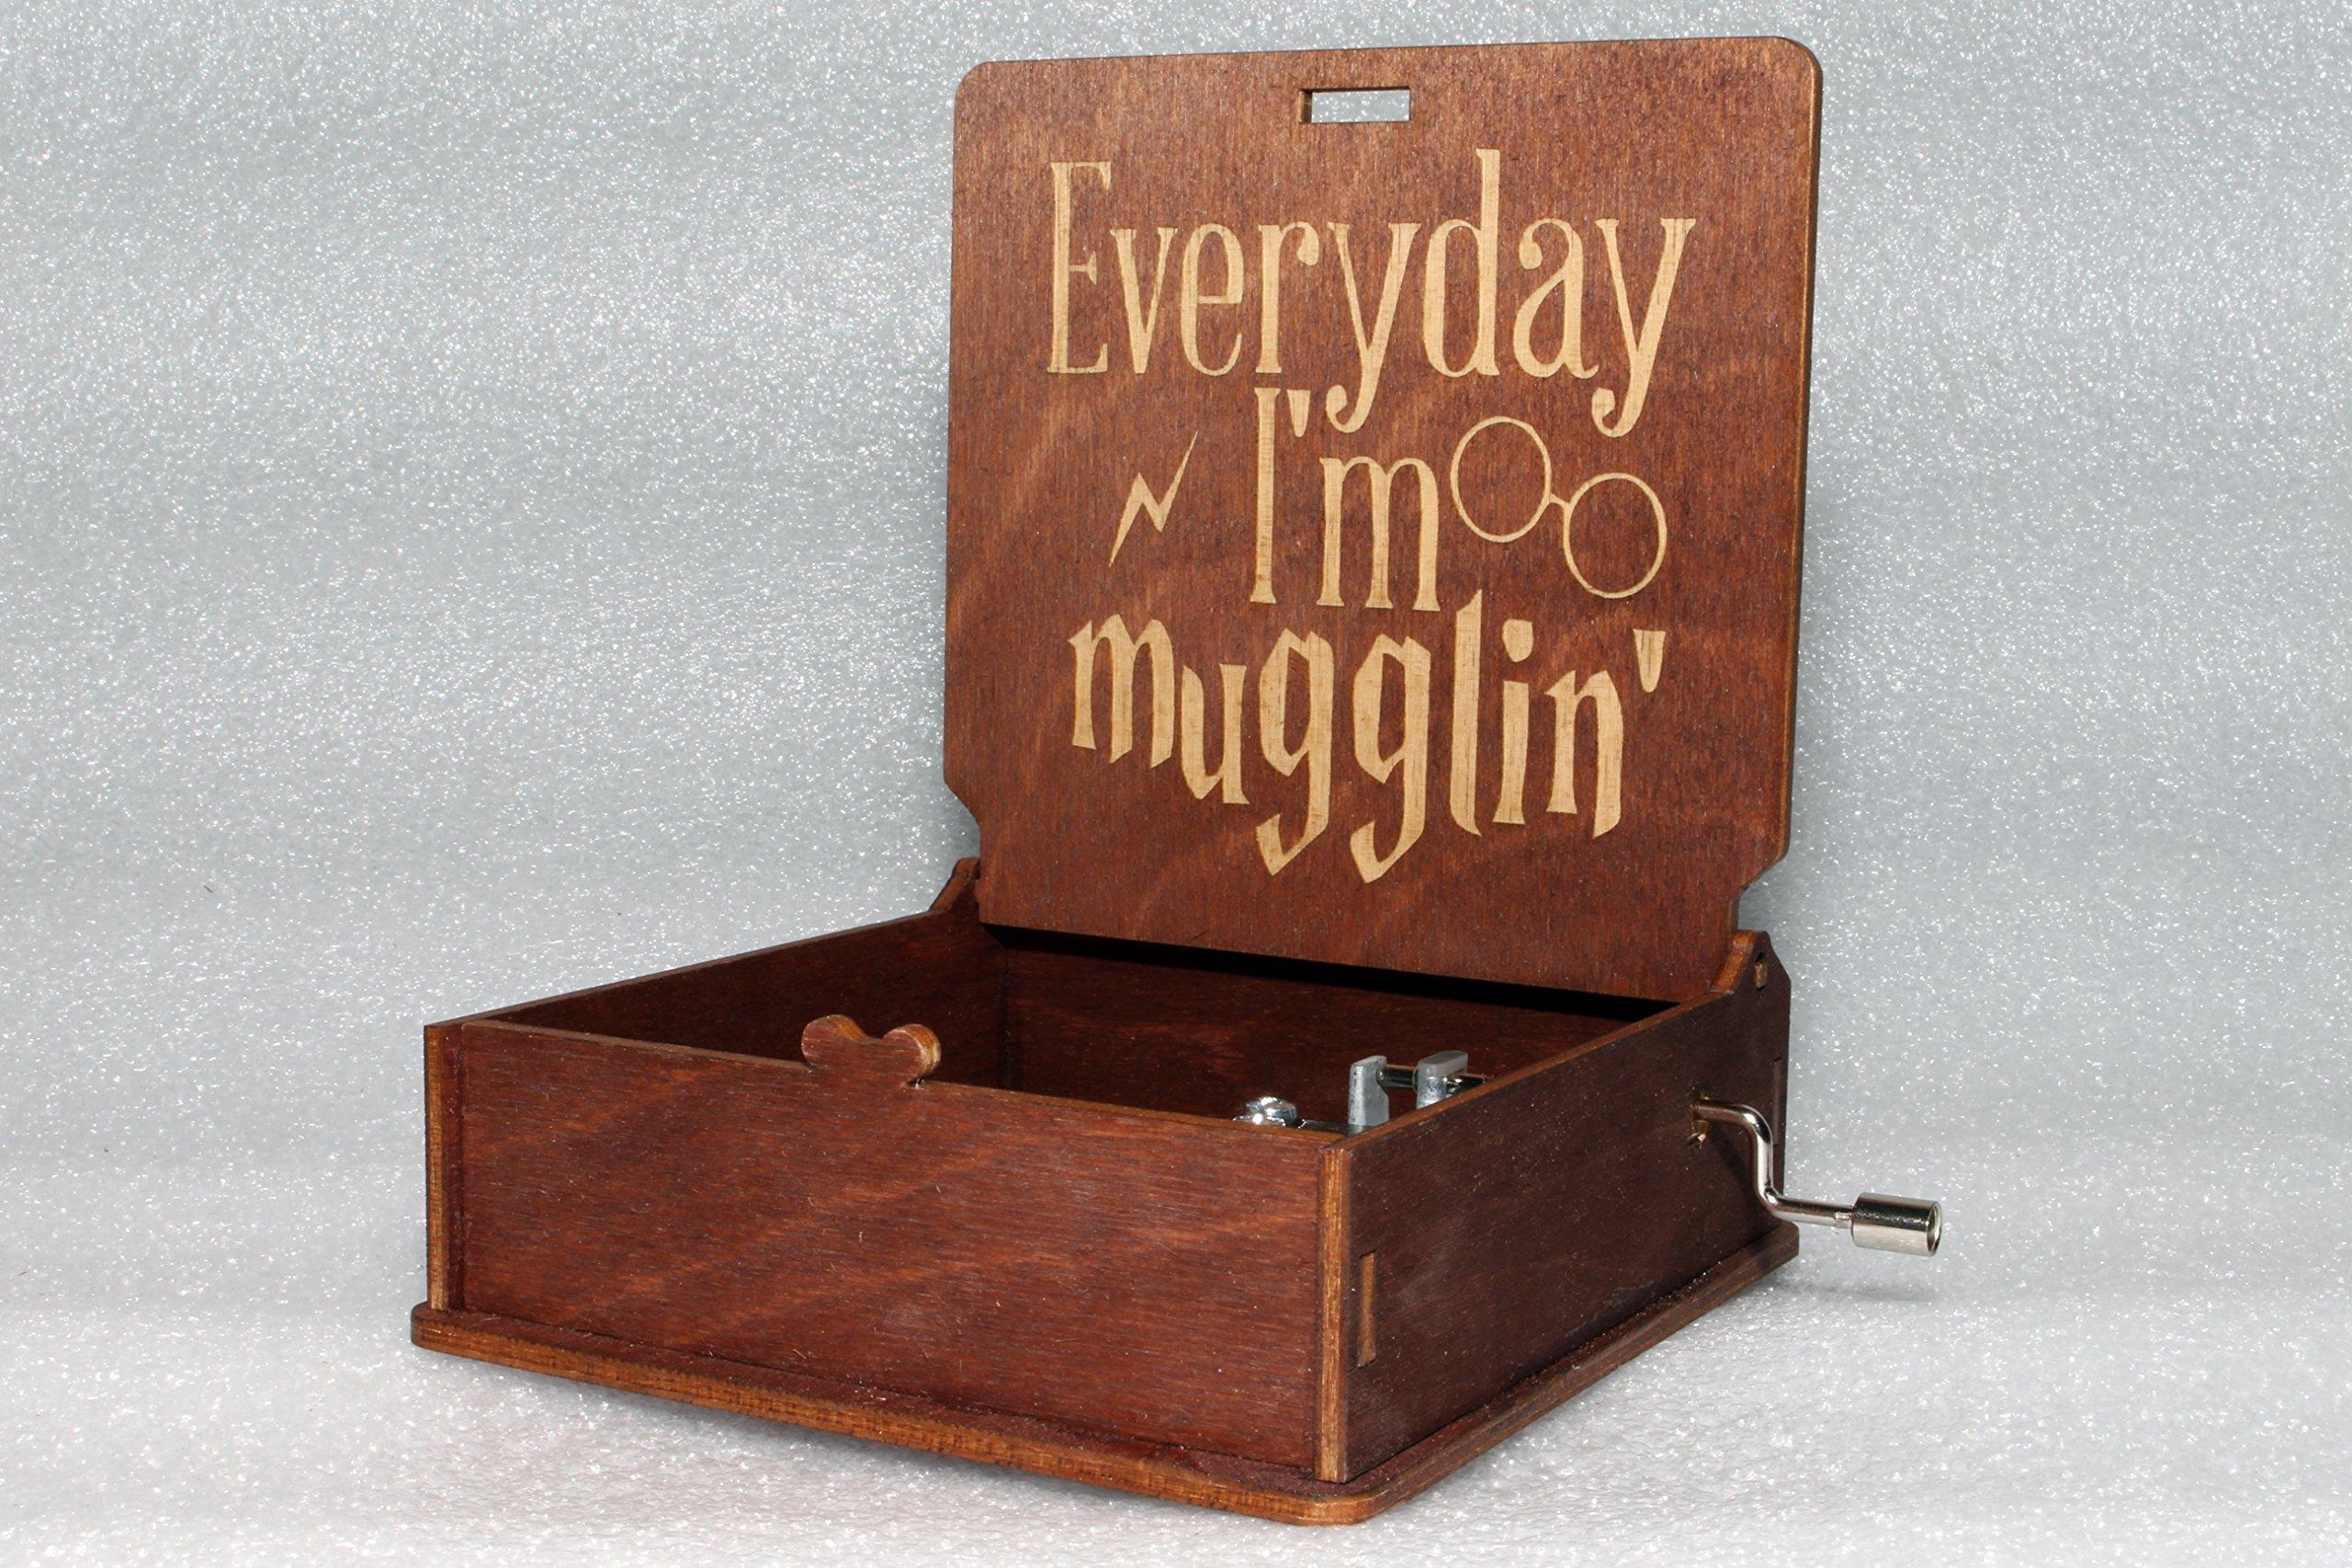 Harry Potter Music Box - Everyday I'm Mugglin' - Engraved Wooden Music Box -''Harry's Wondrous World'' - Hogwarts Deathly Hallows Wand Magic Hat - Hand Crank Movement